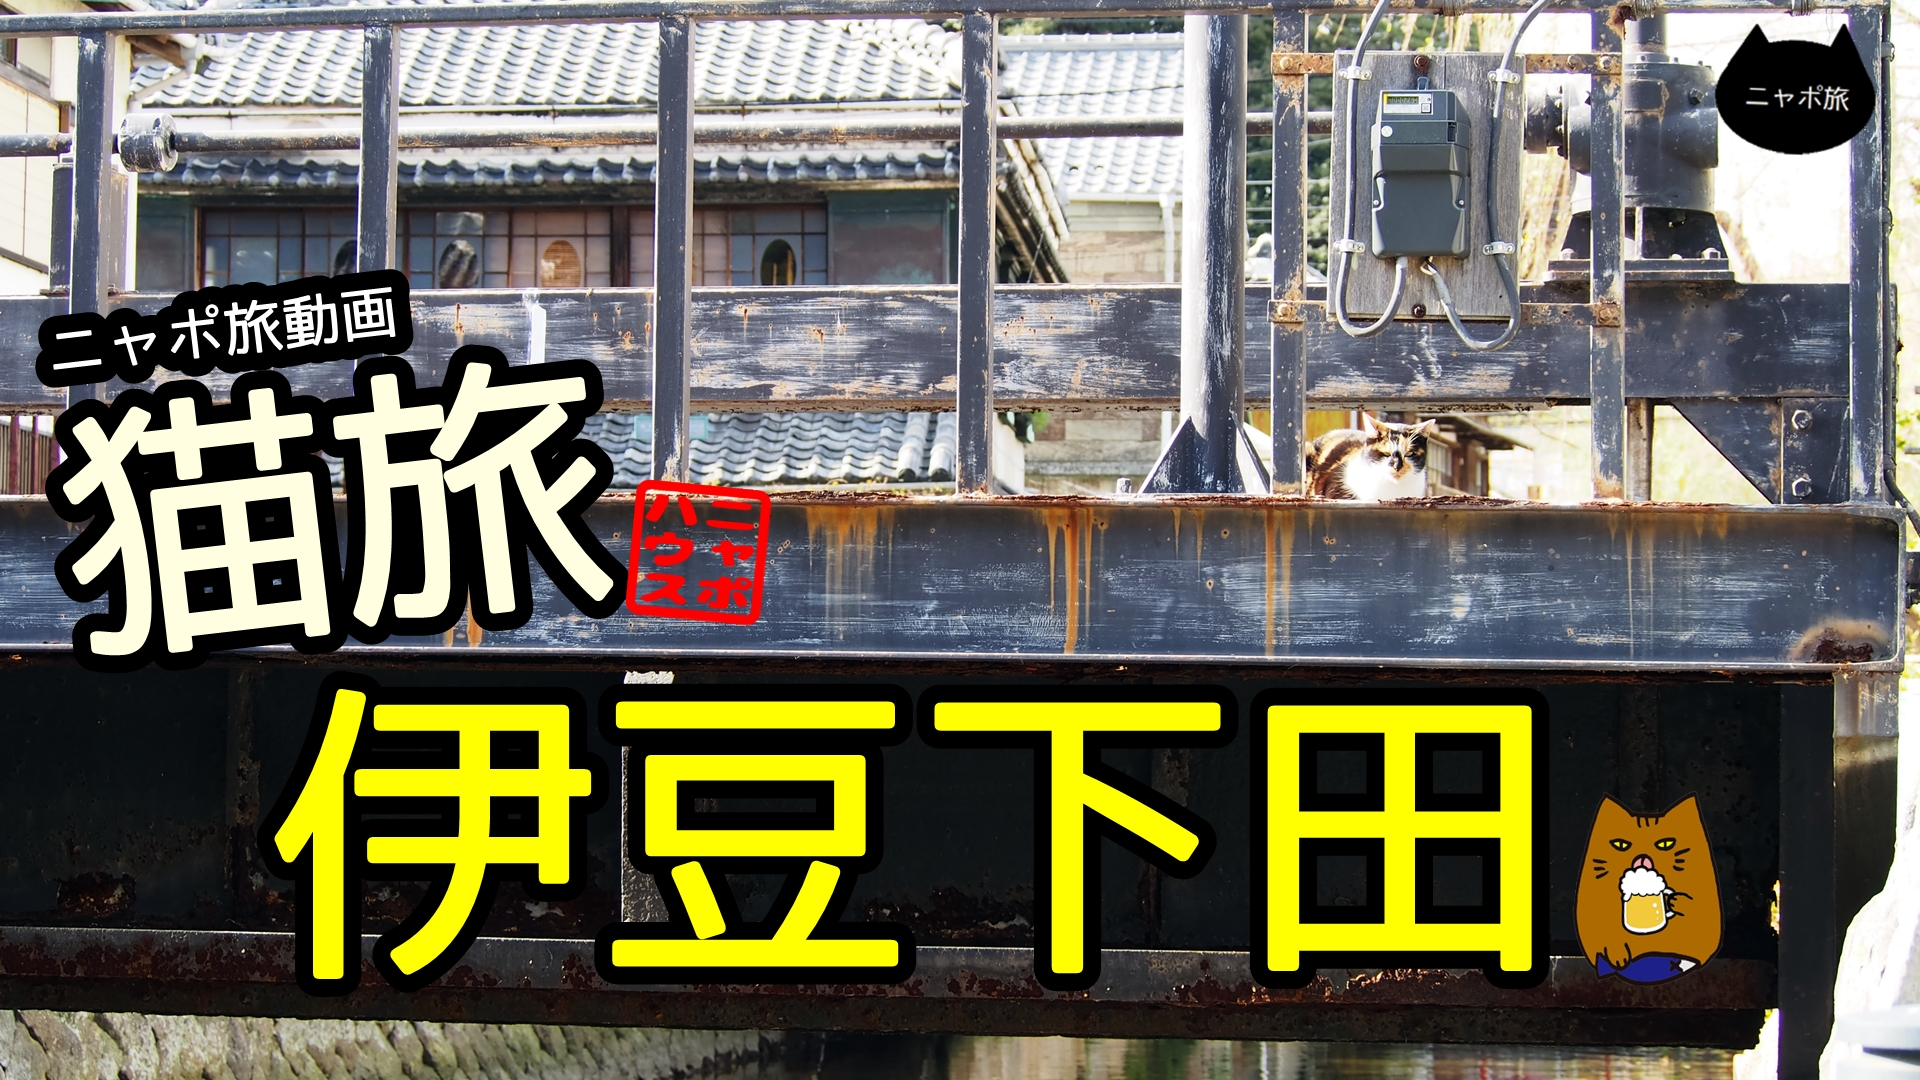 ニャポ旅46 動画編 伊豆下田